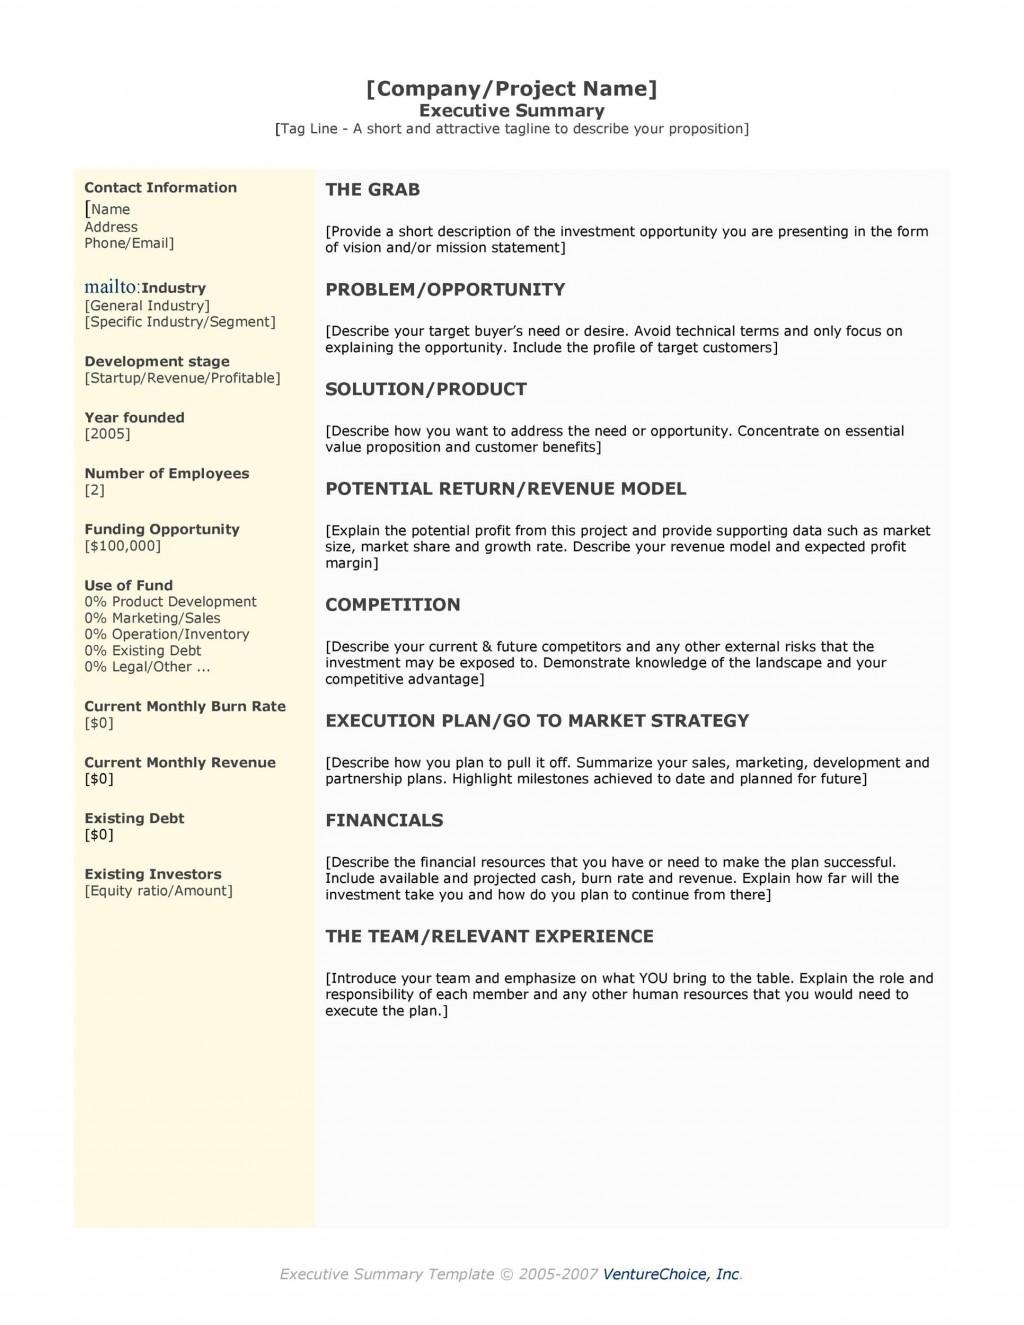 003 Stunning Executive Summary Template Doc Design  Document Example GoogleLarge